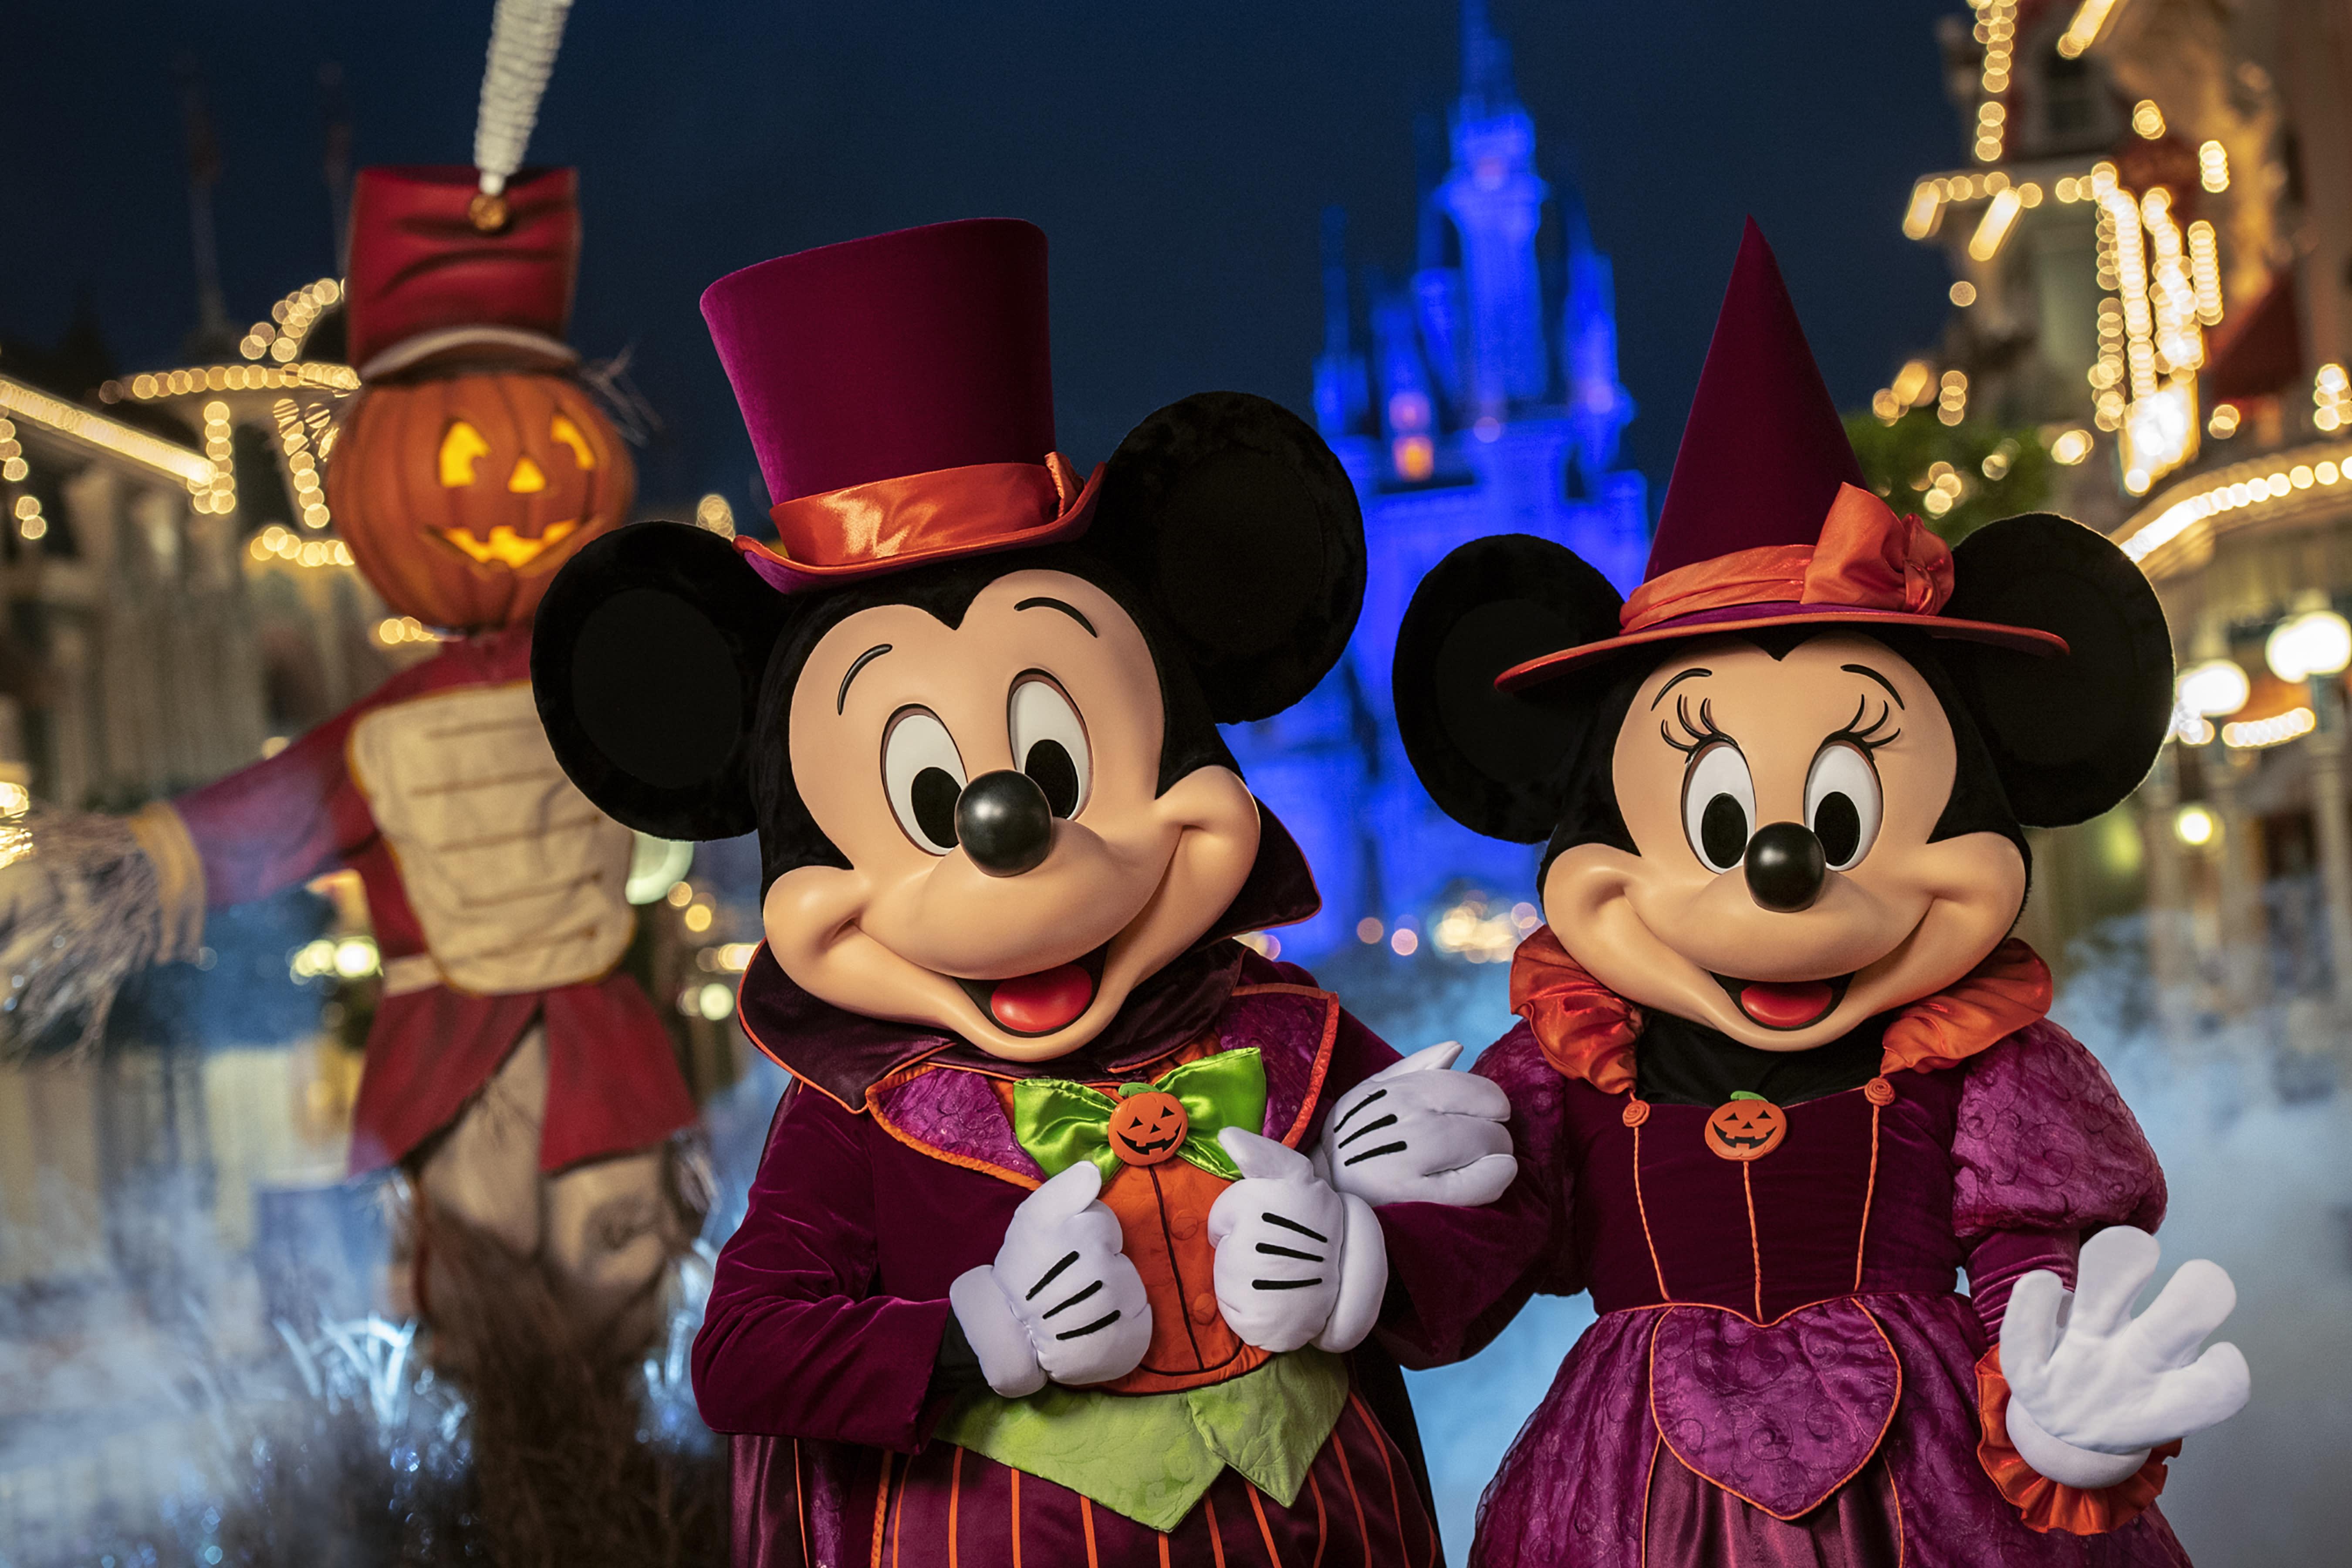 Mickey's Not-So-Scary Halloween Party at Magic Kingdom Park at Walt Disney World Resort in Orlando